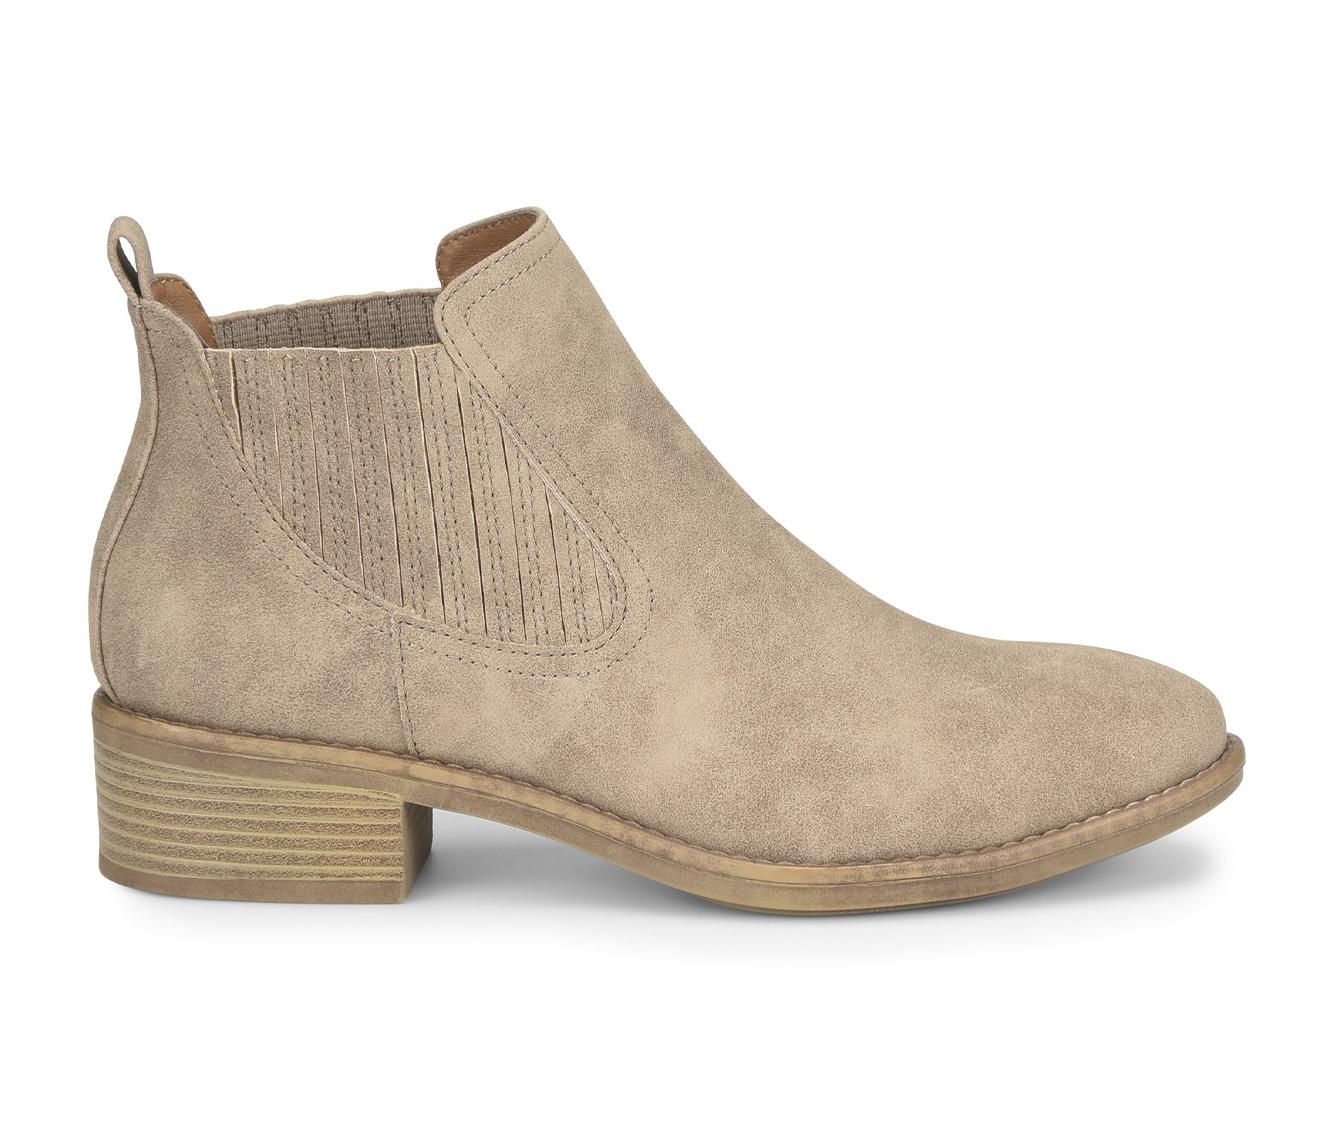 EuroSoft Colisa Women's Boots (Beige - Faux Leather)